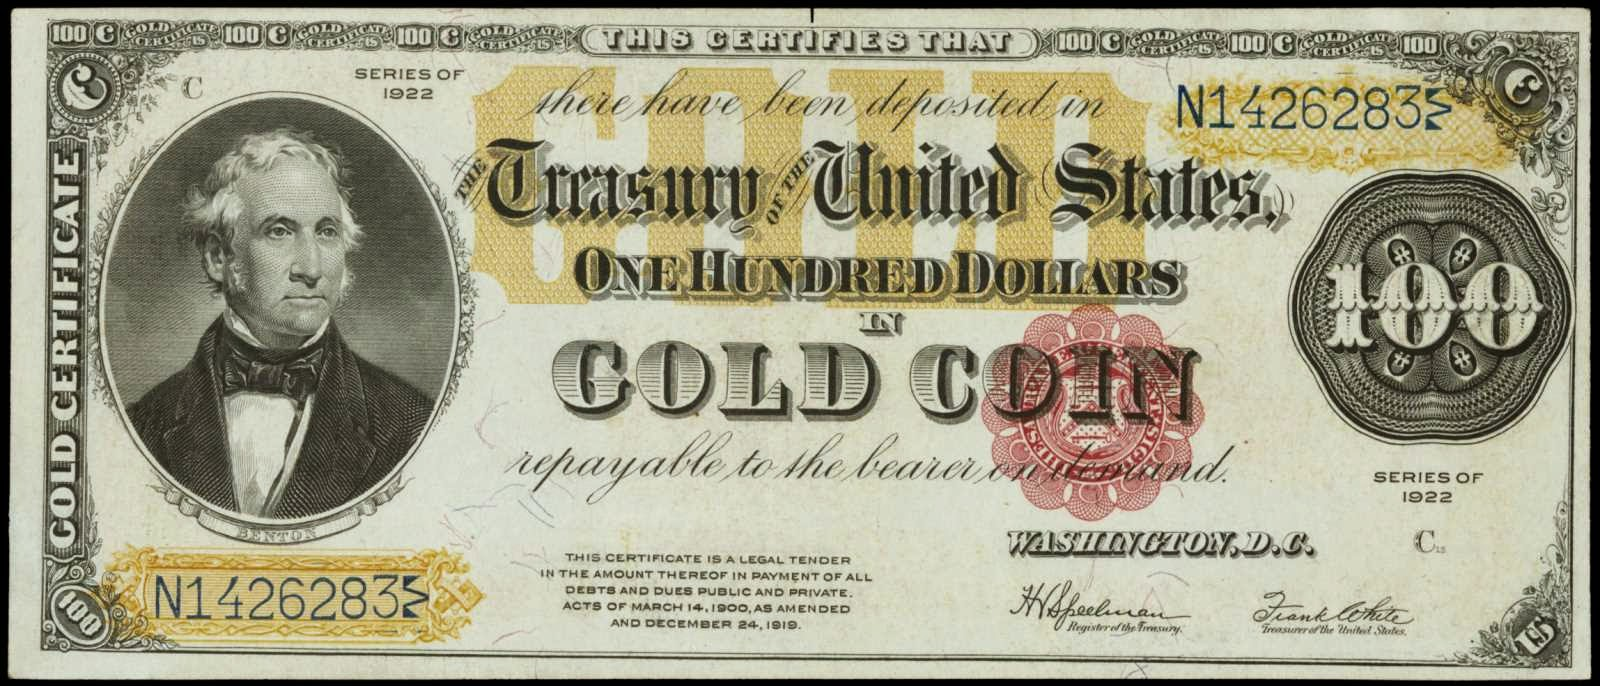 100 dollar billus dollar bills 1922 100 gold certificate thomas hart benton 1betcityfo Gallery